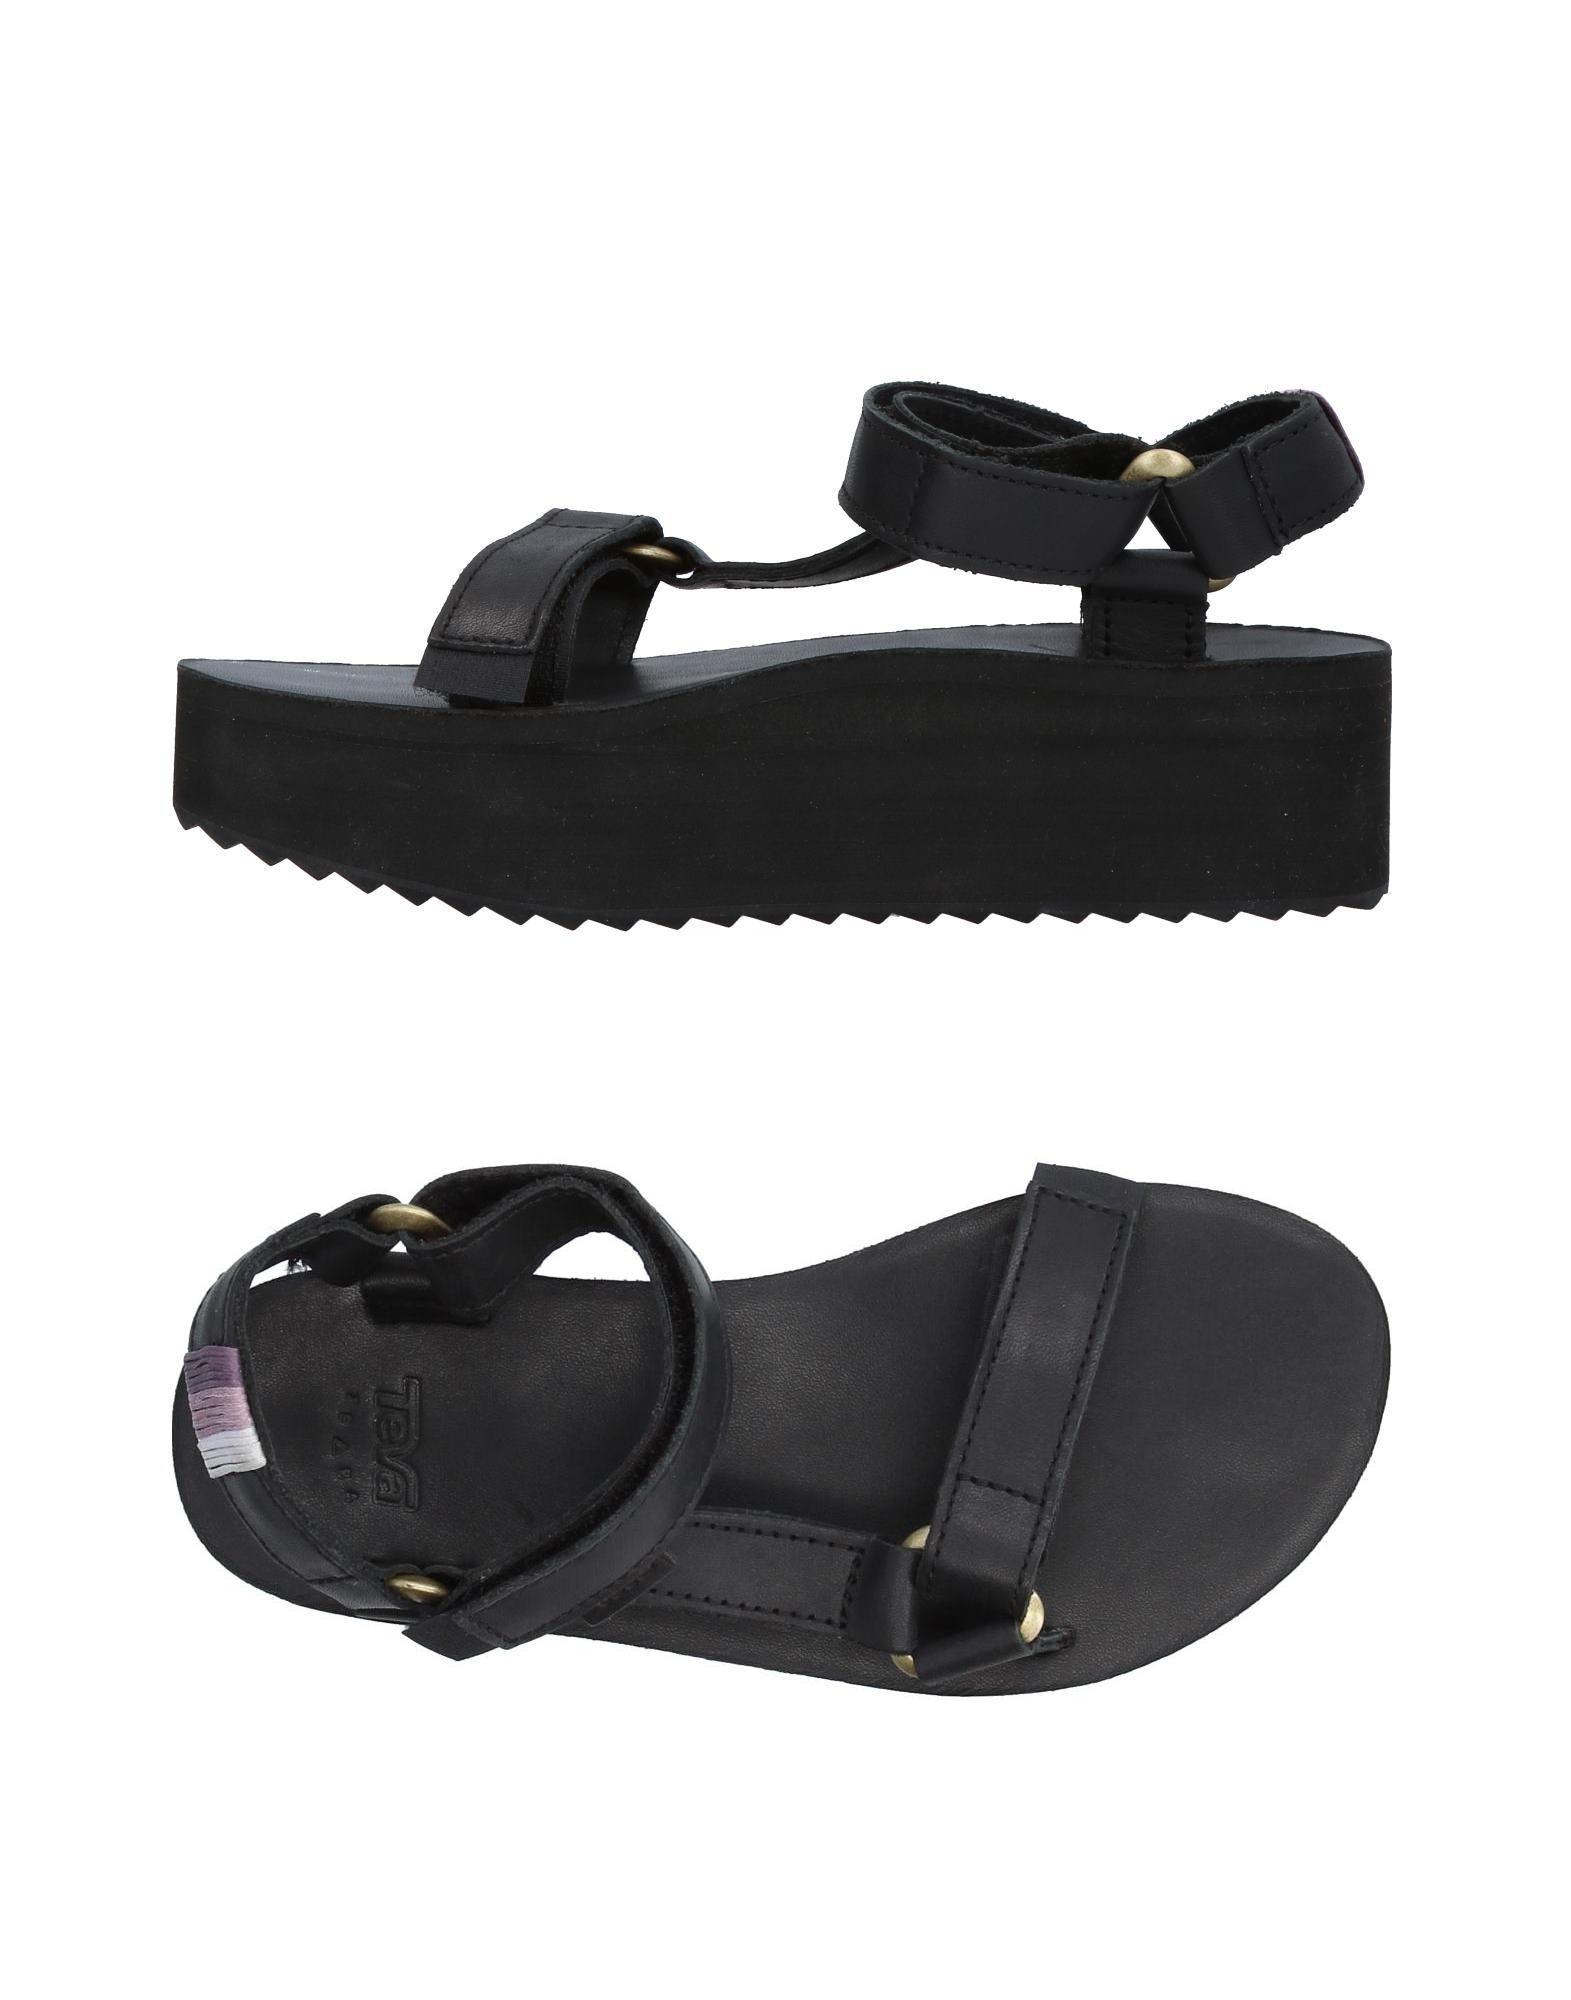 99975817eb22 Teva Sandals - Women Teva Sandals online on YOOX United States ...